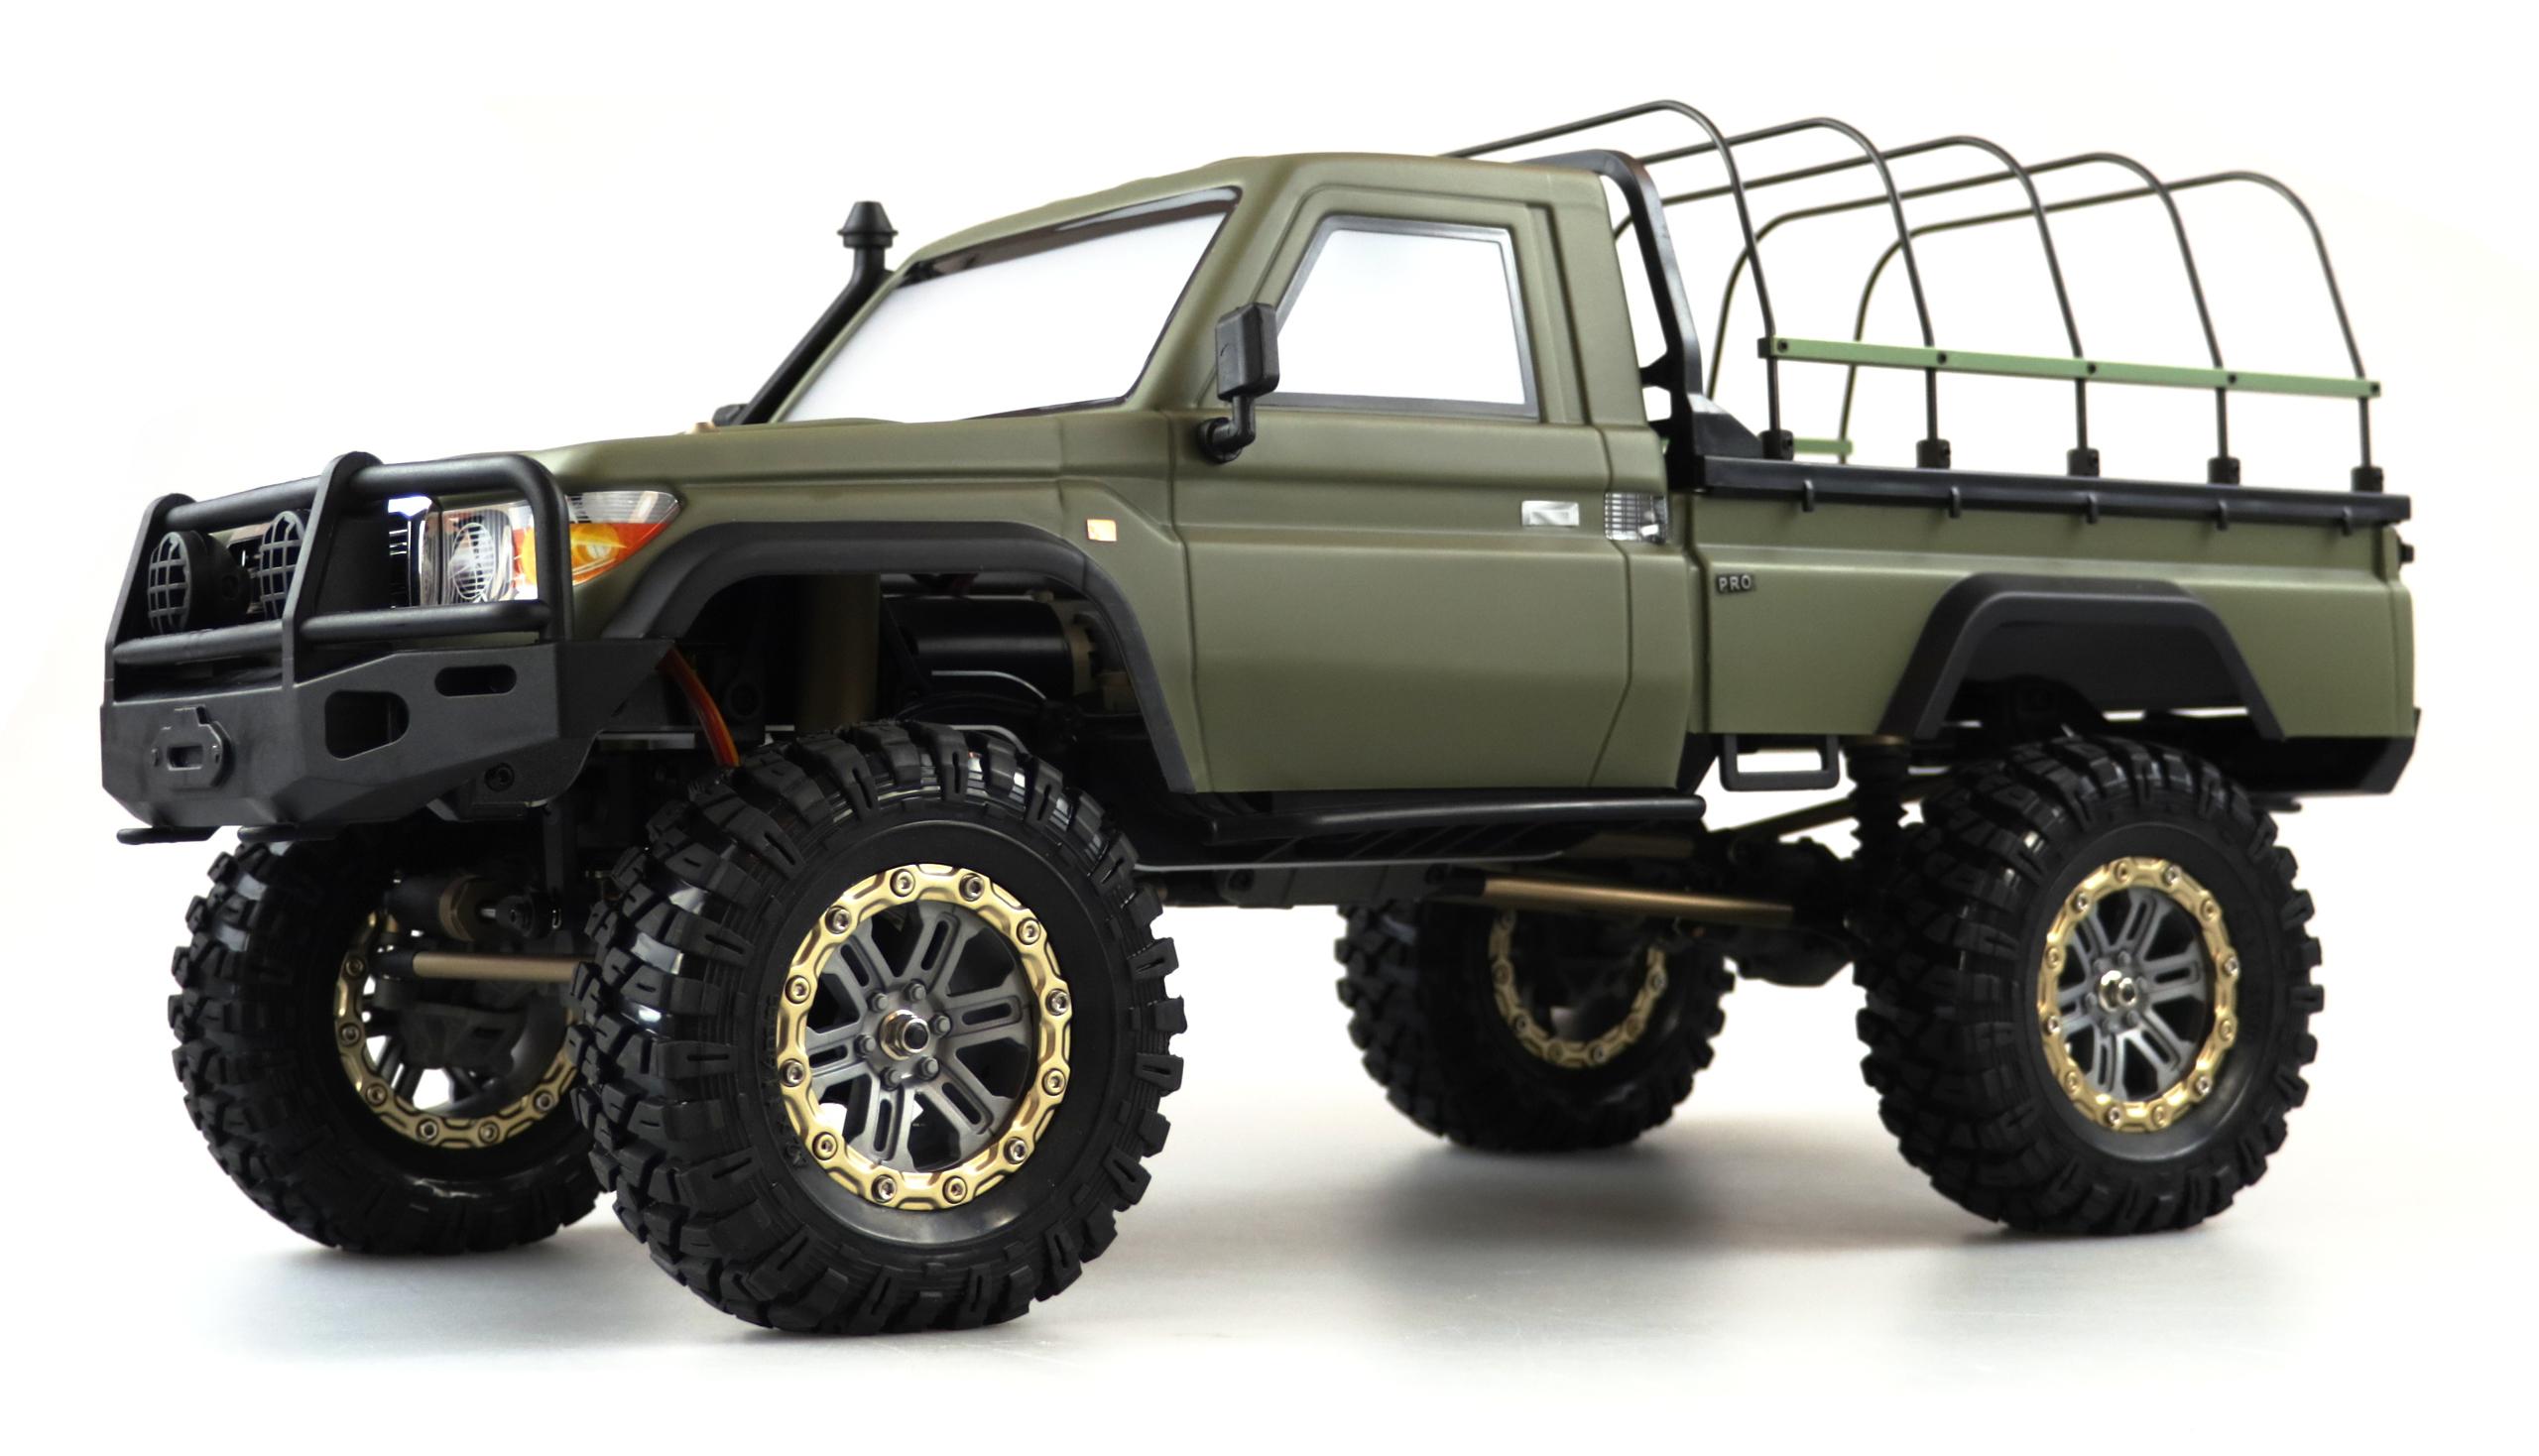 Amewi AMXROCK RCX10PS - Off-Road-Wagen - Elektromotor - 1:10 - Fahrbereit (RTD) - Grün - Metall